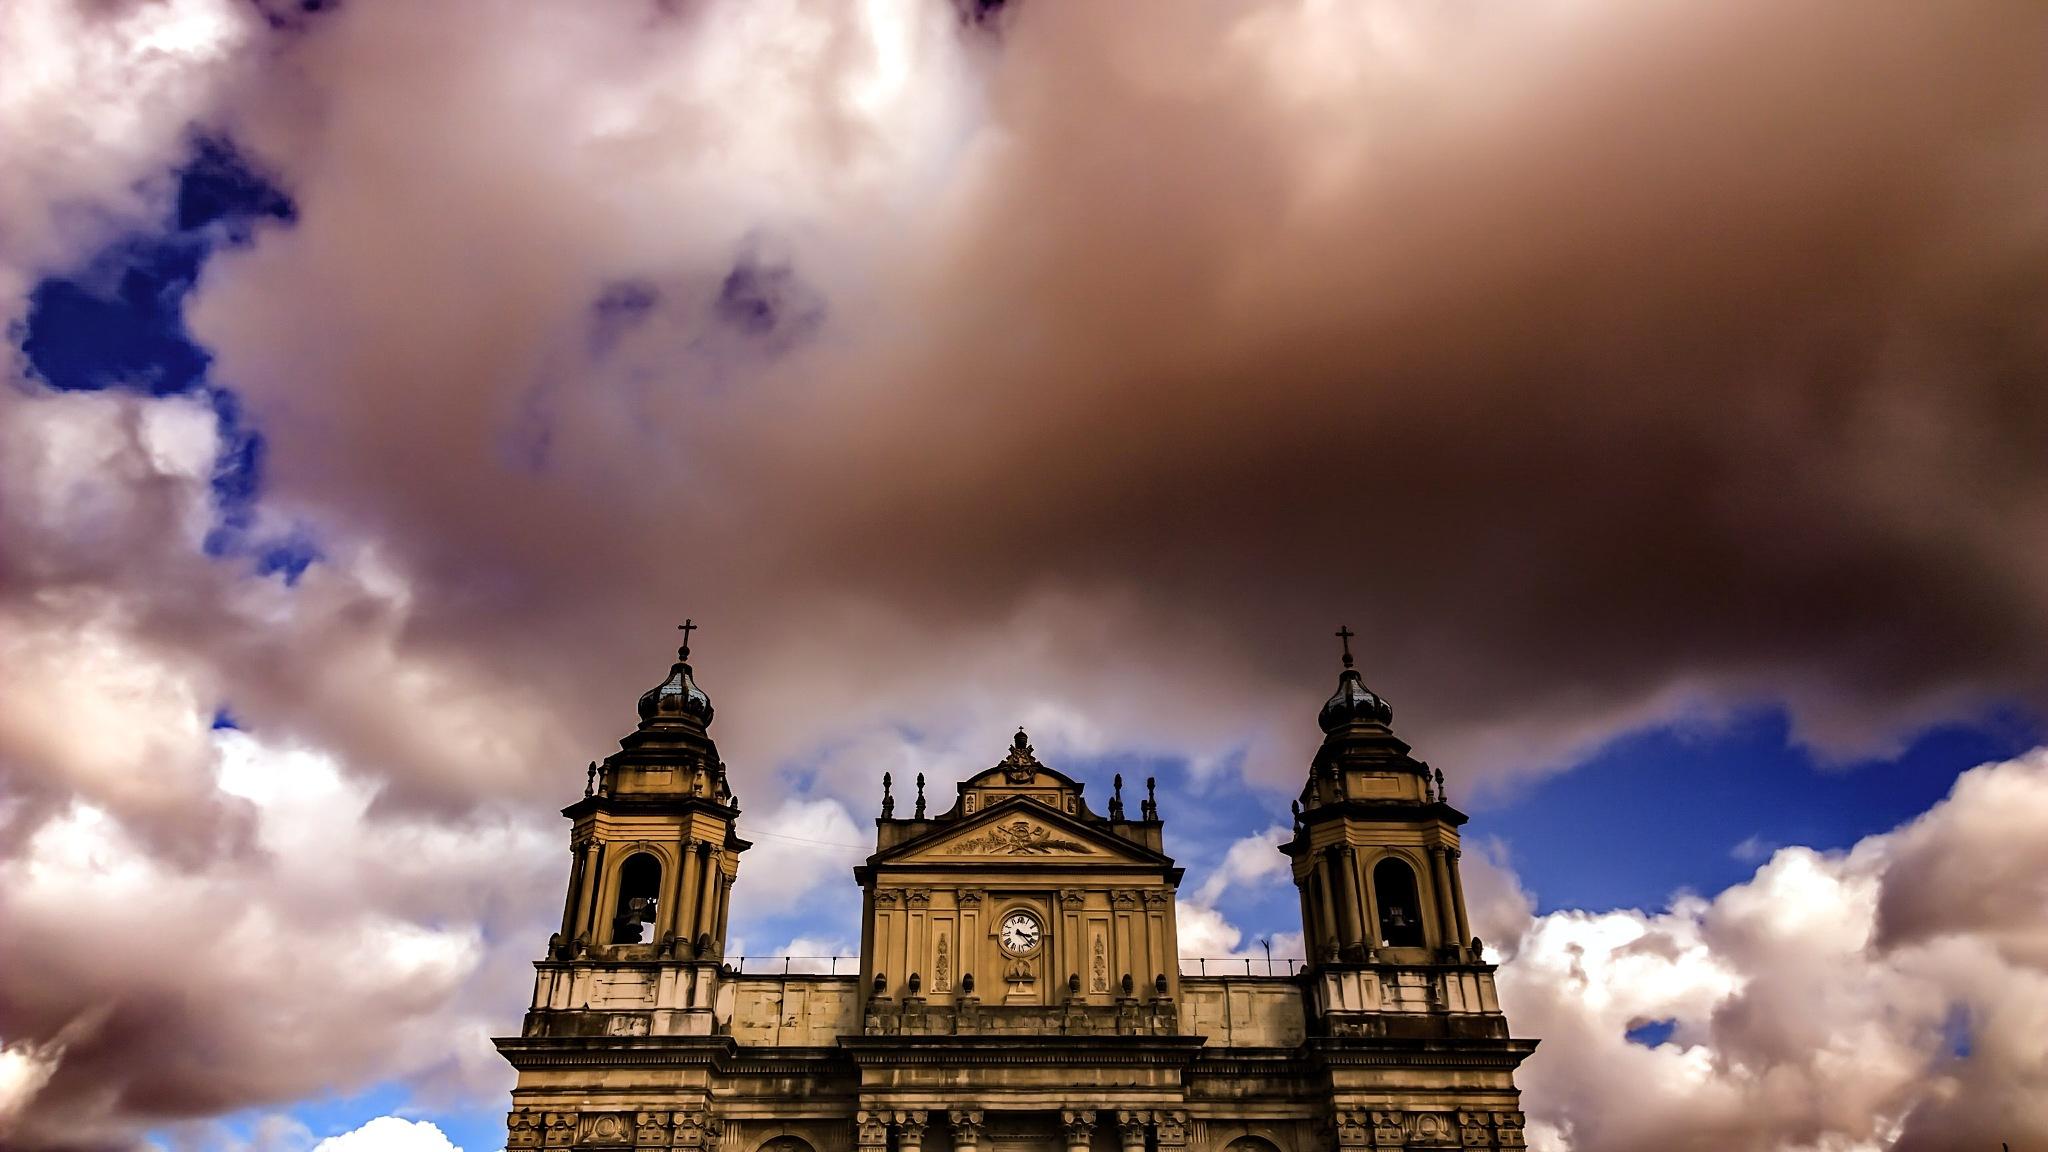 Untitled by Gerardo Pacheco